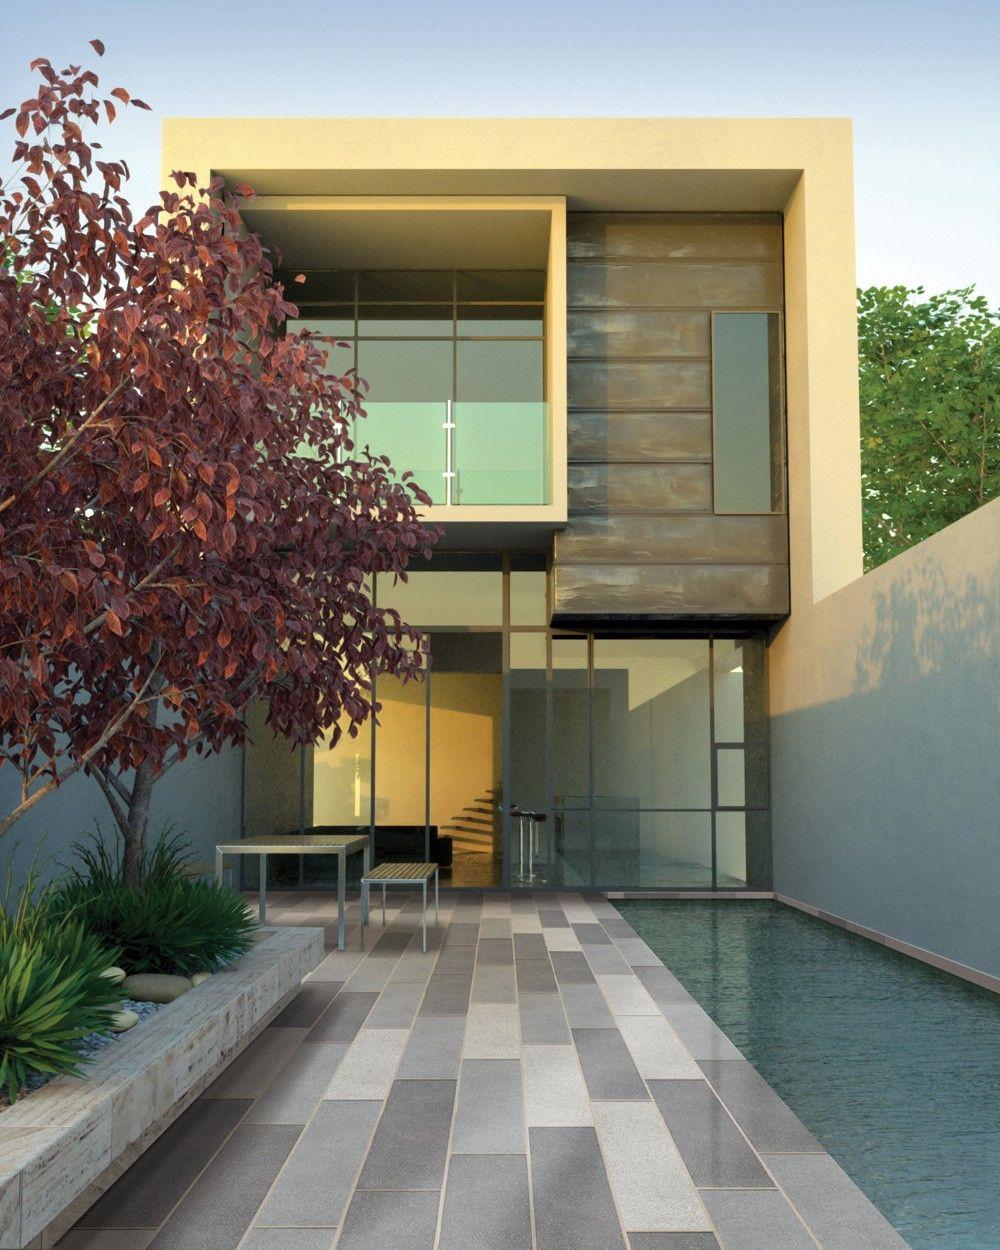 Bradstone Stonemaster Long Aspect Patio 35 Per M2 Granite Grey Look Stonemaster Is Now Going To Even Modern House Design House Design Photos Narrow Lot House